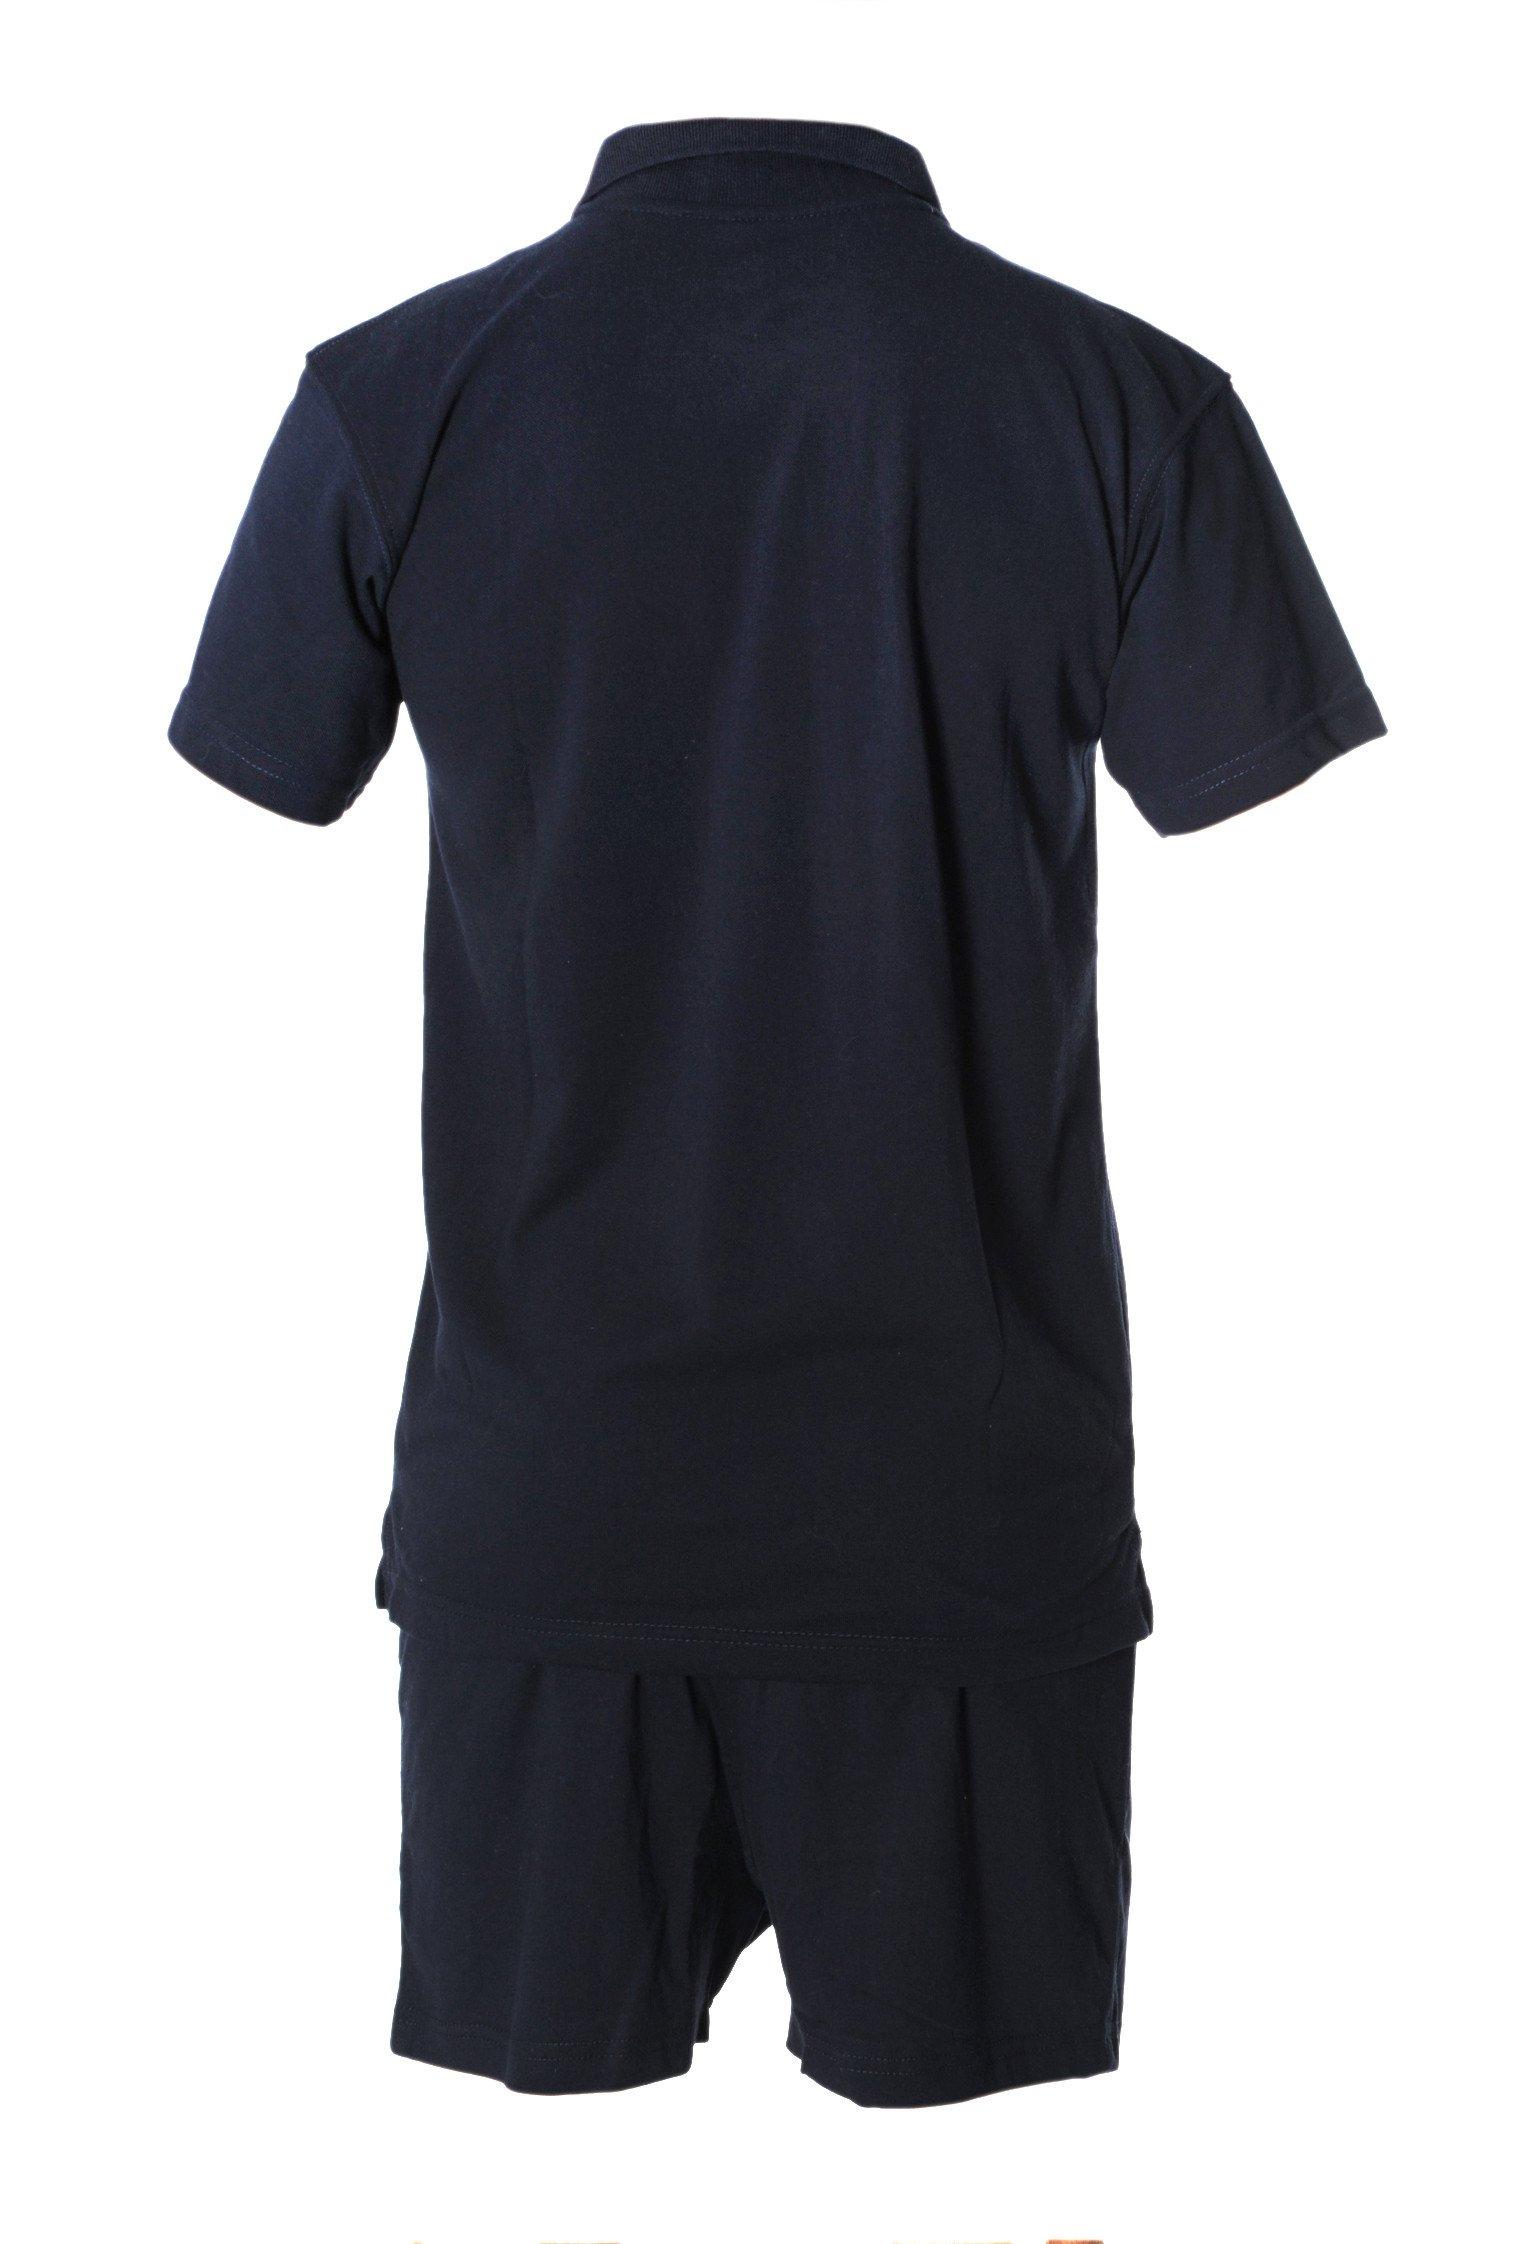 Polo Crossfit bleu marine